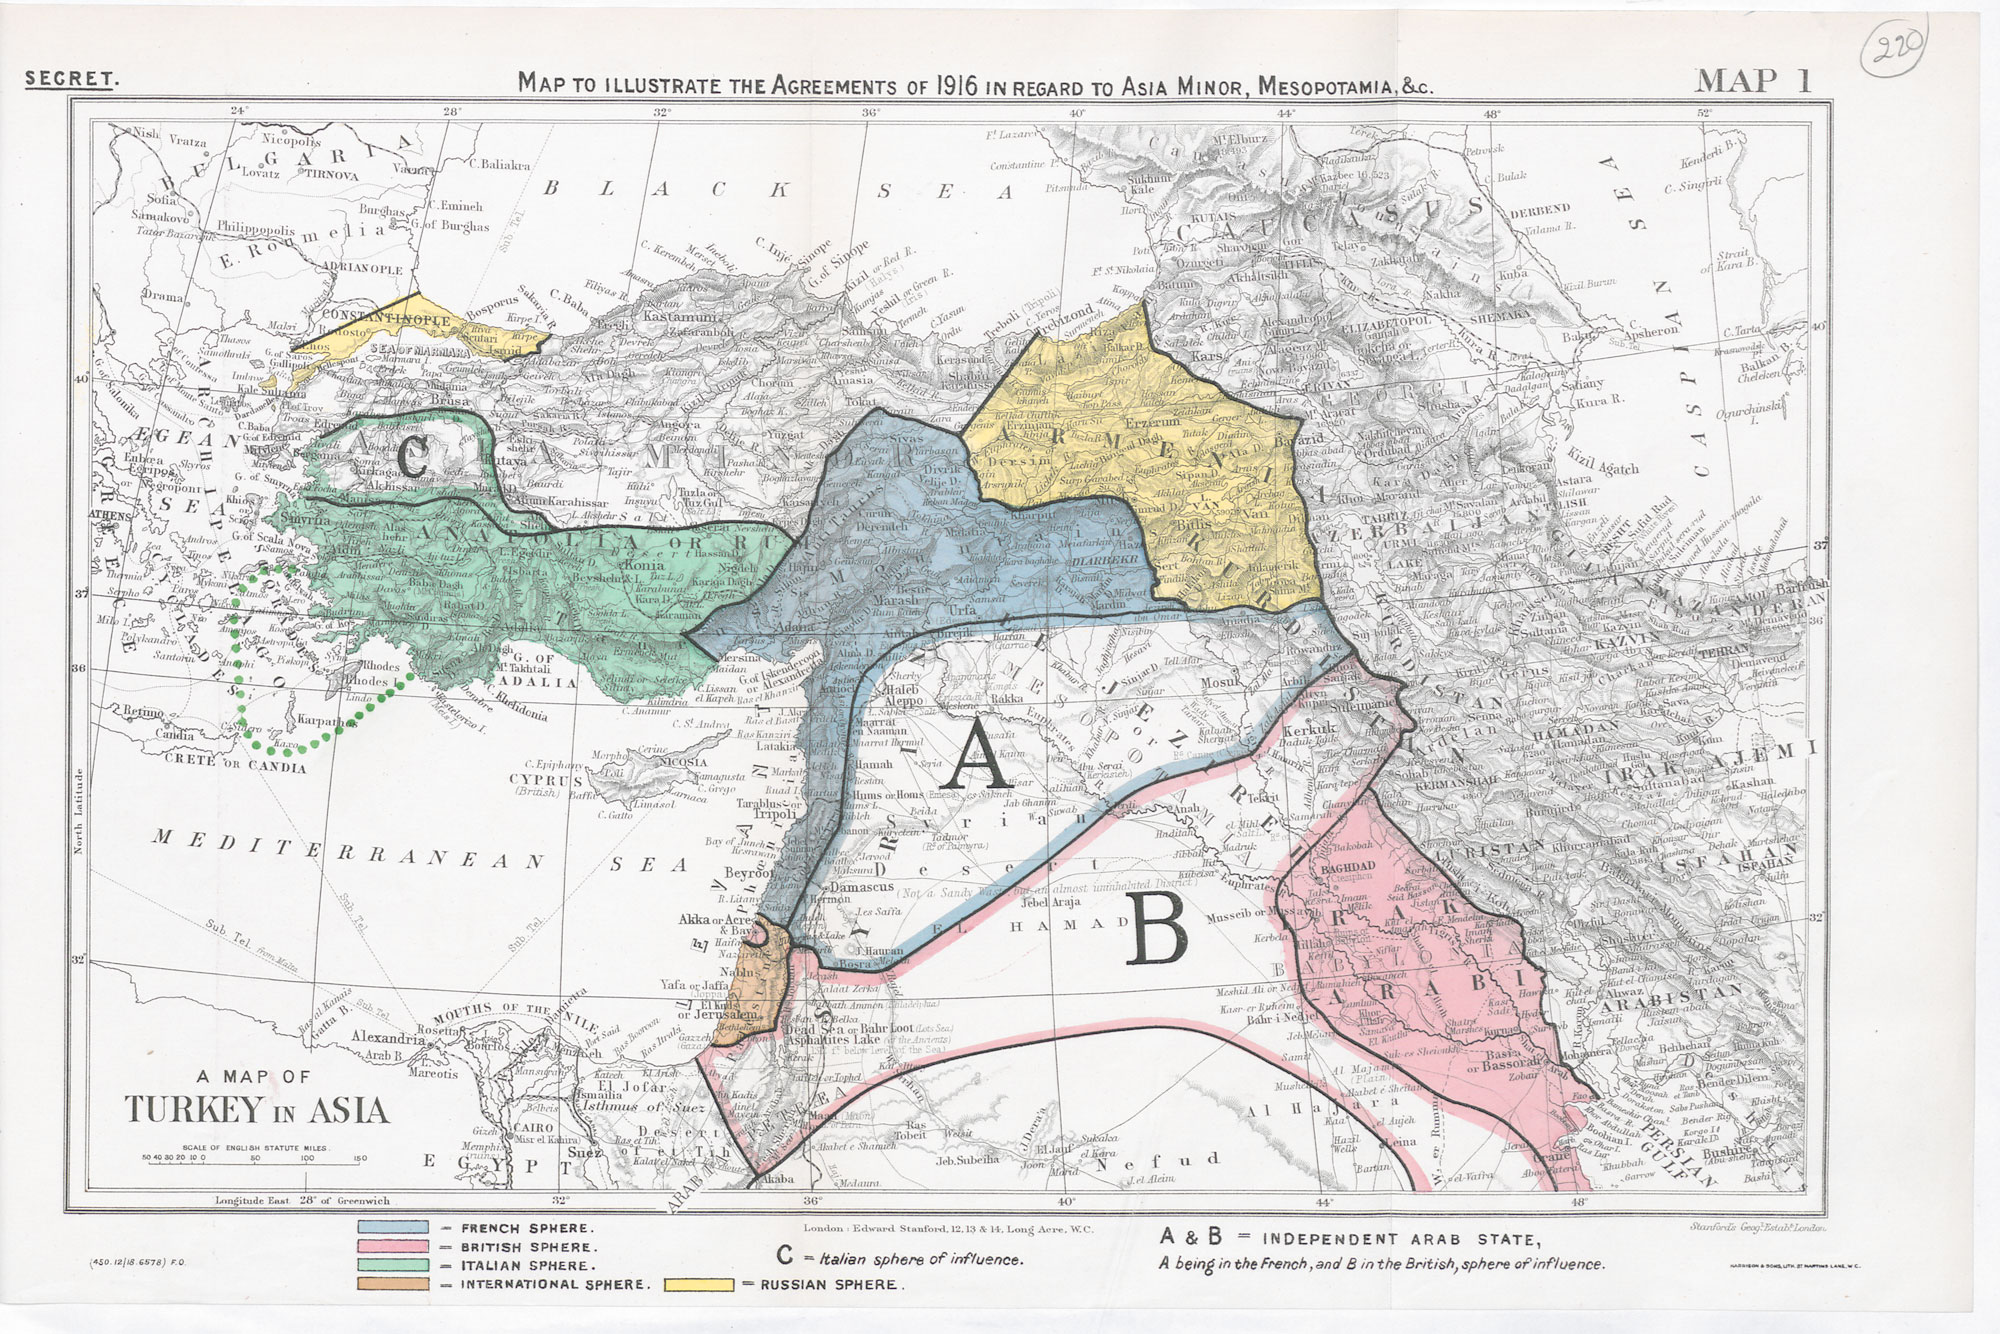 https://upload.wikimedia.org/wikipedia/commons/b/b7/Peace-conference-memoranda-respecting-syria-arabia-palestine5.jpg